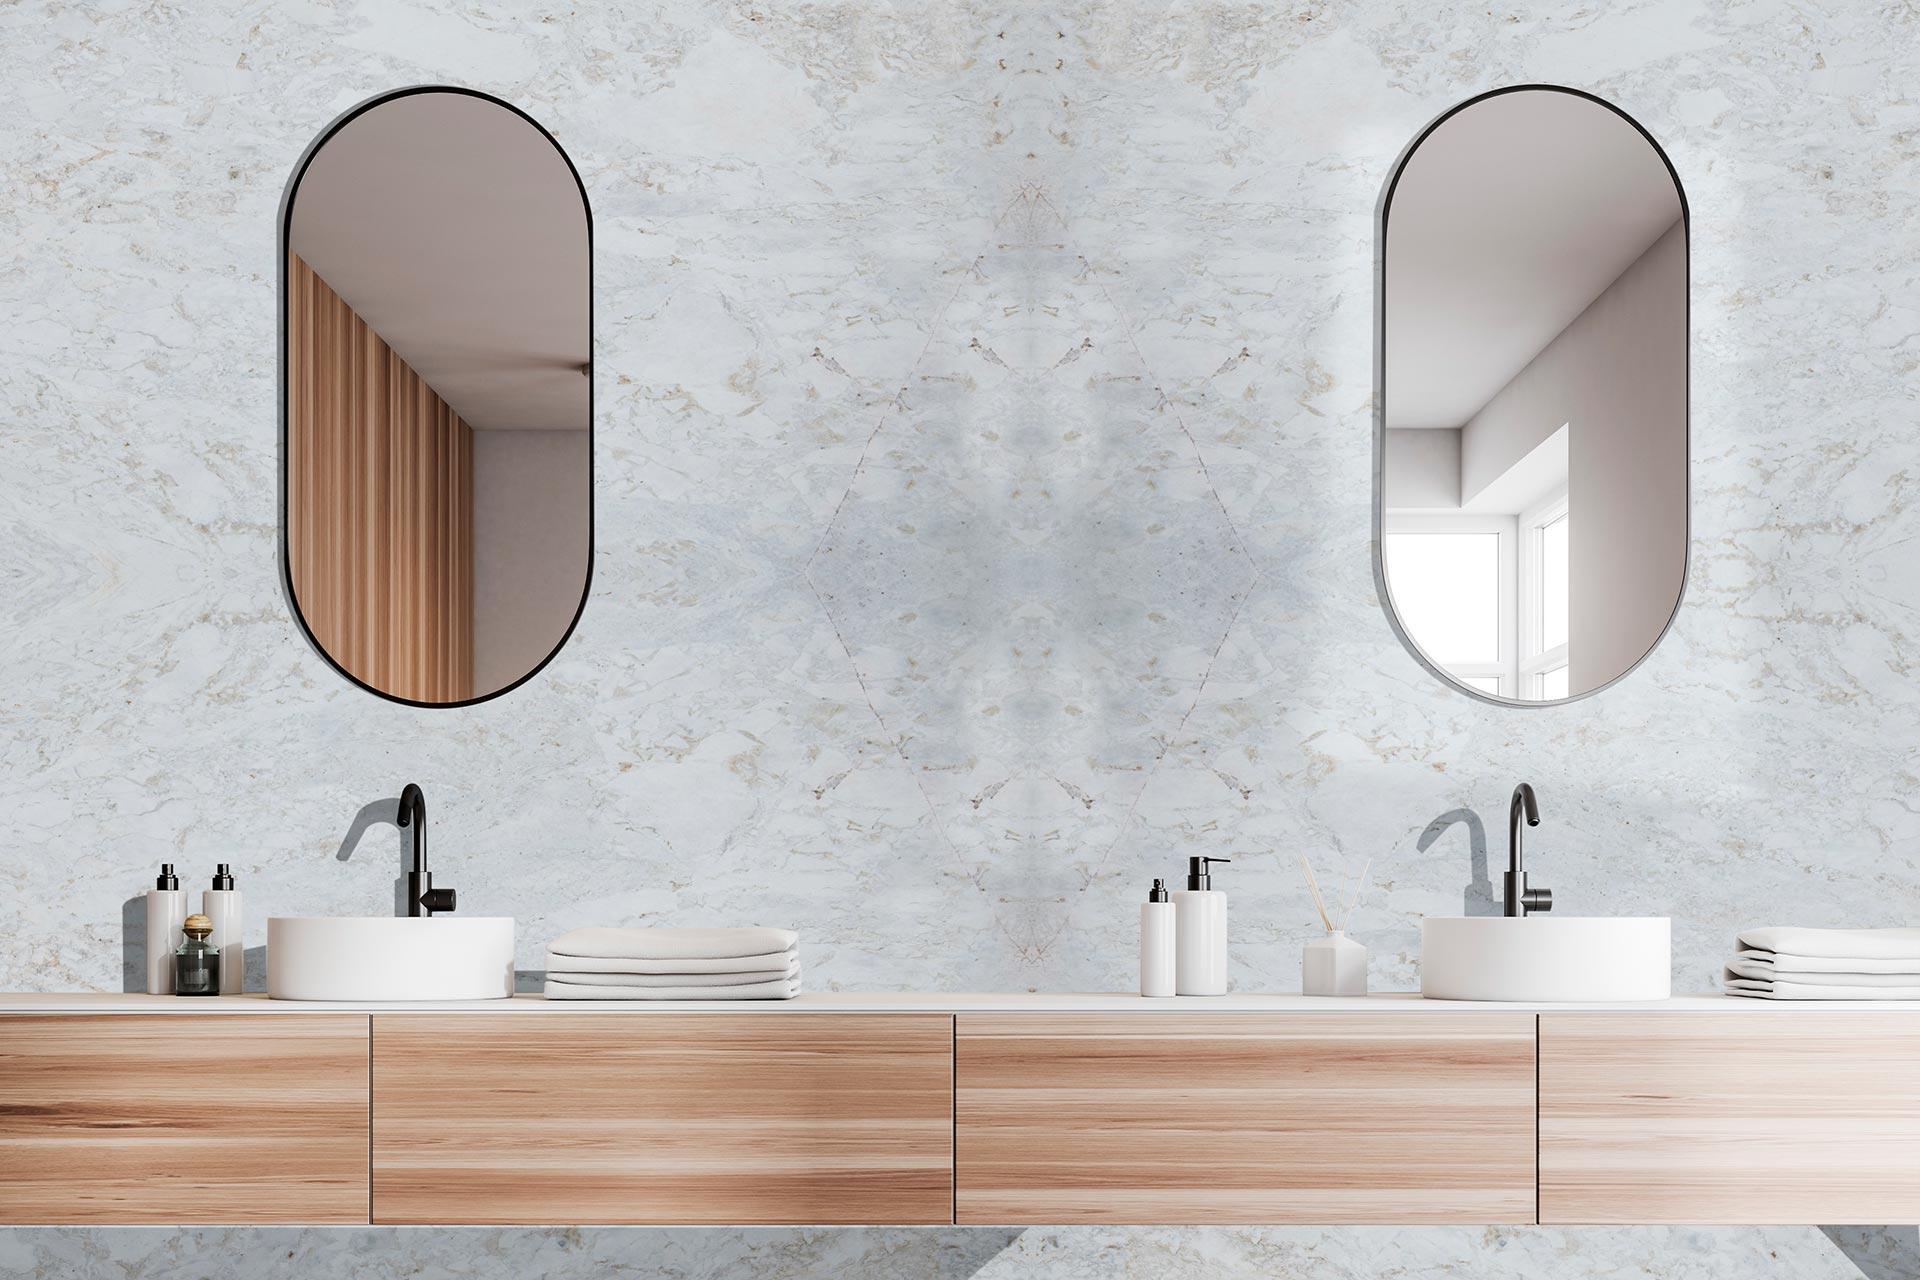 marble calacatta oro bathroom